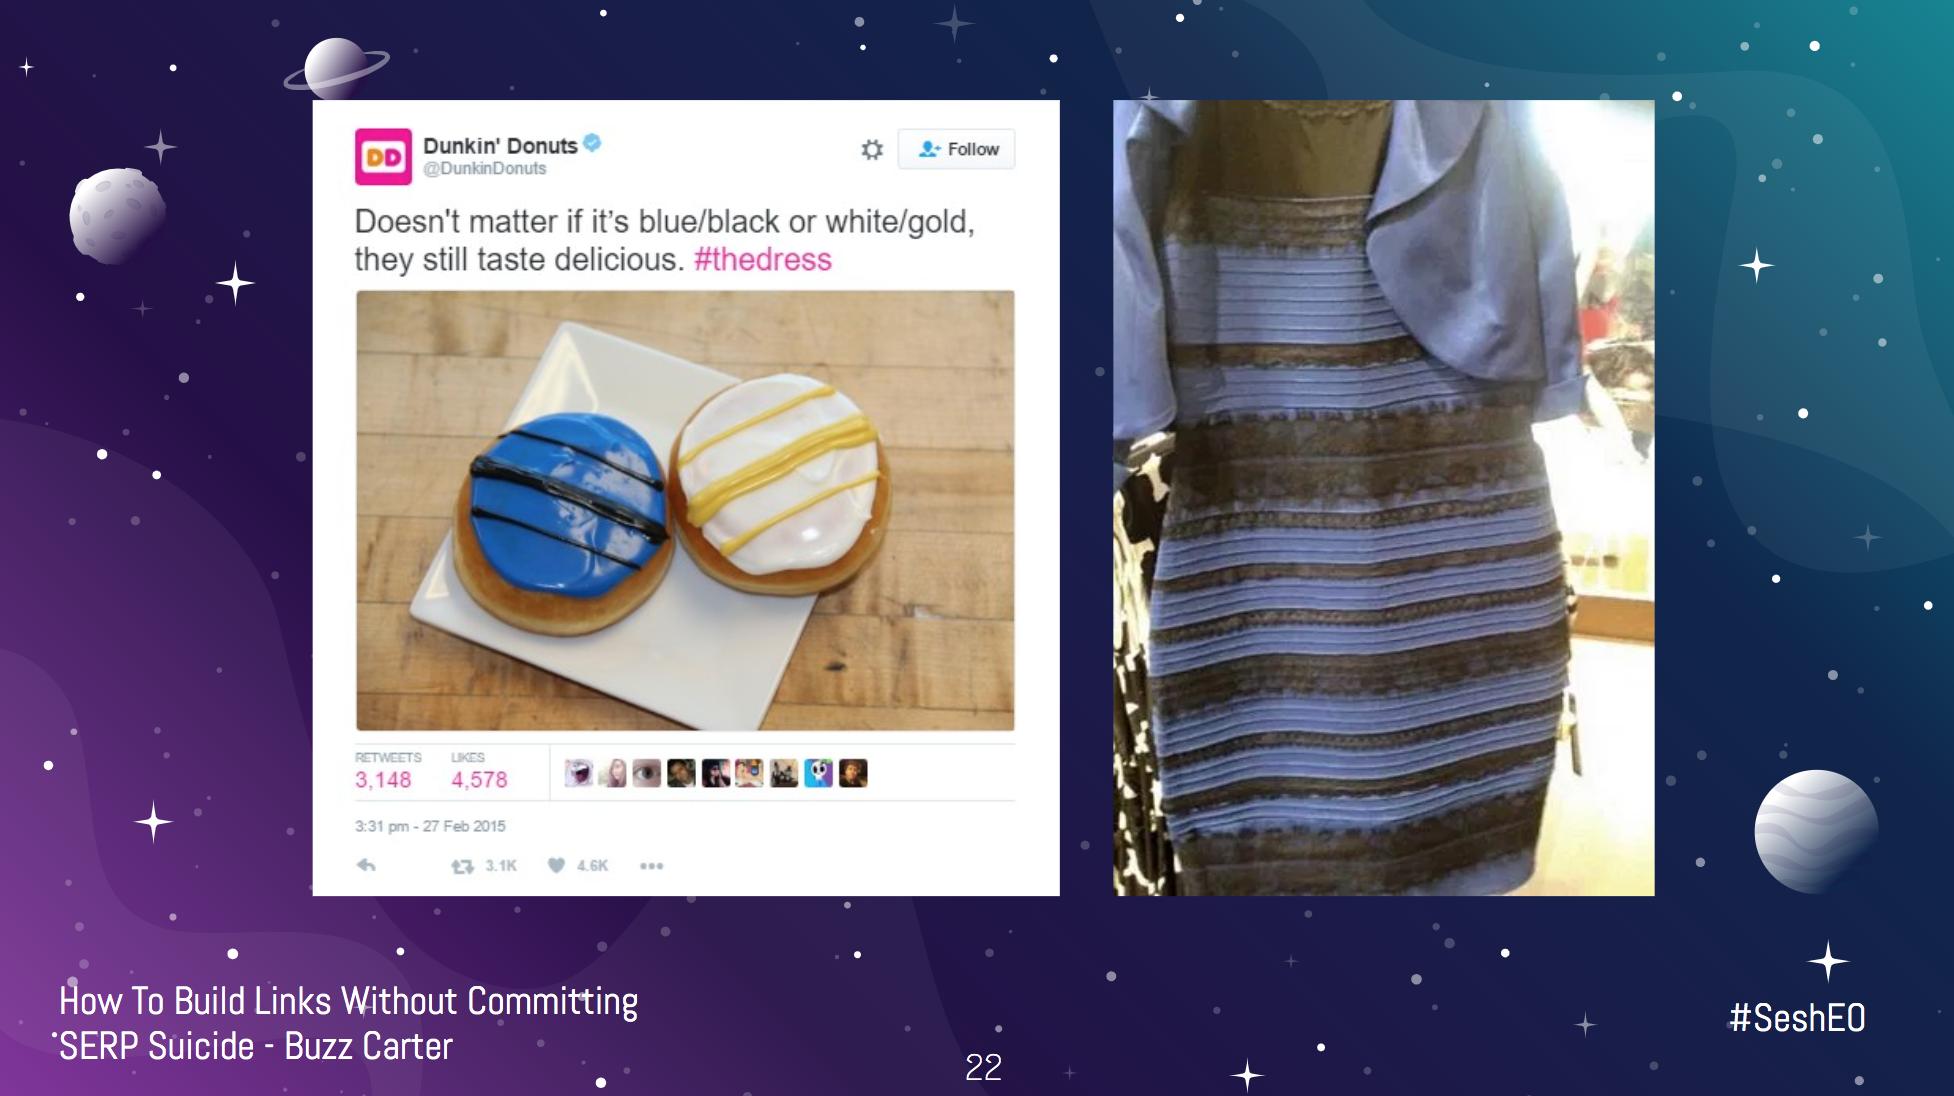 Dunkin Donuts newsjacking example